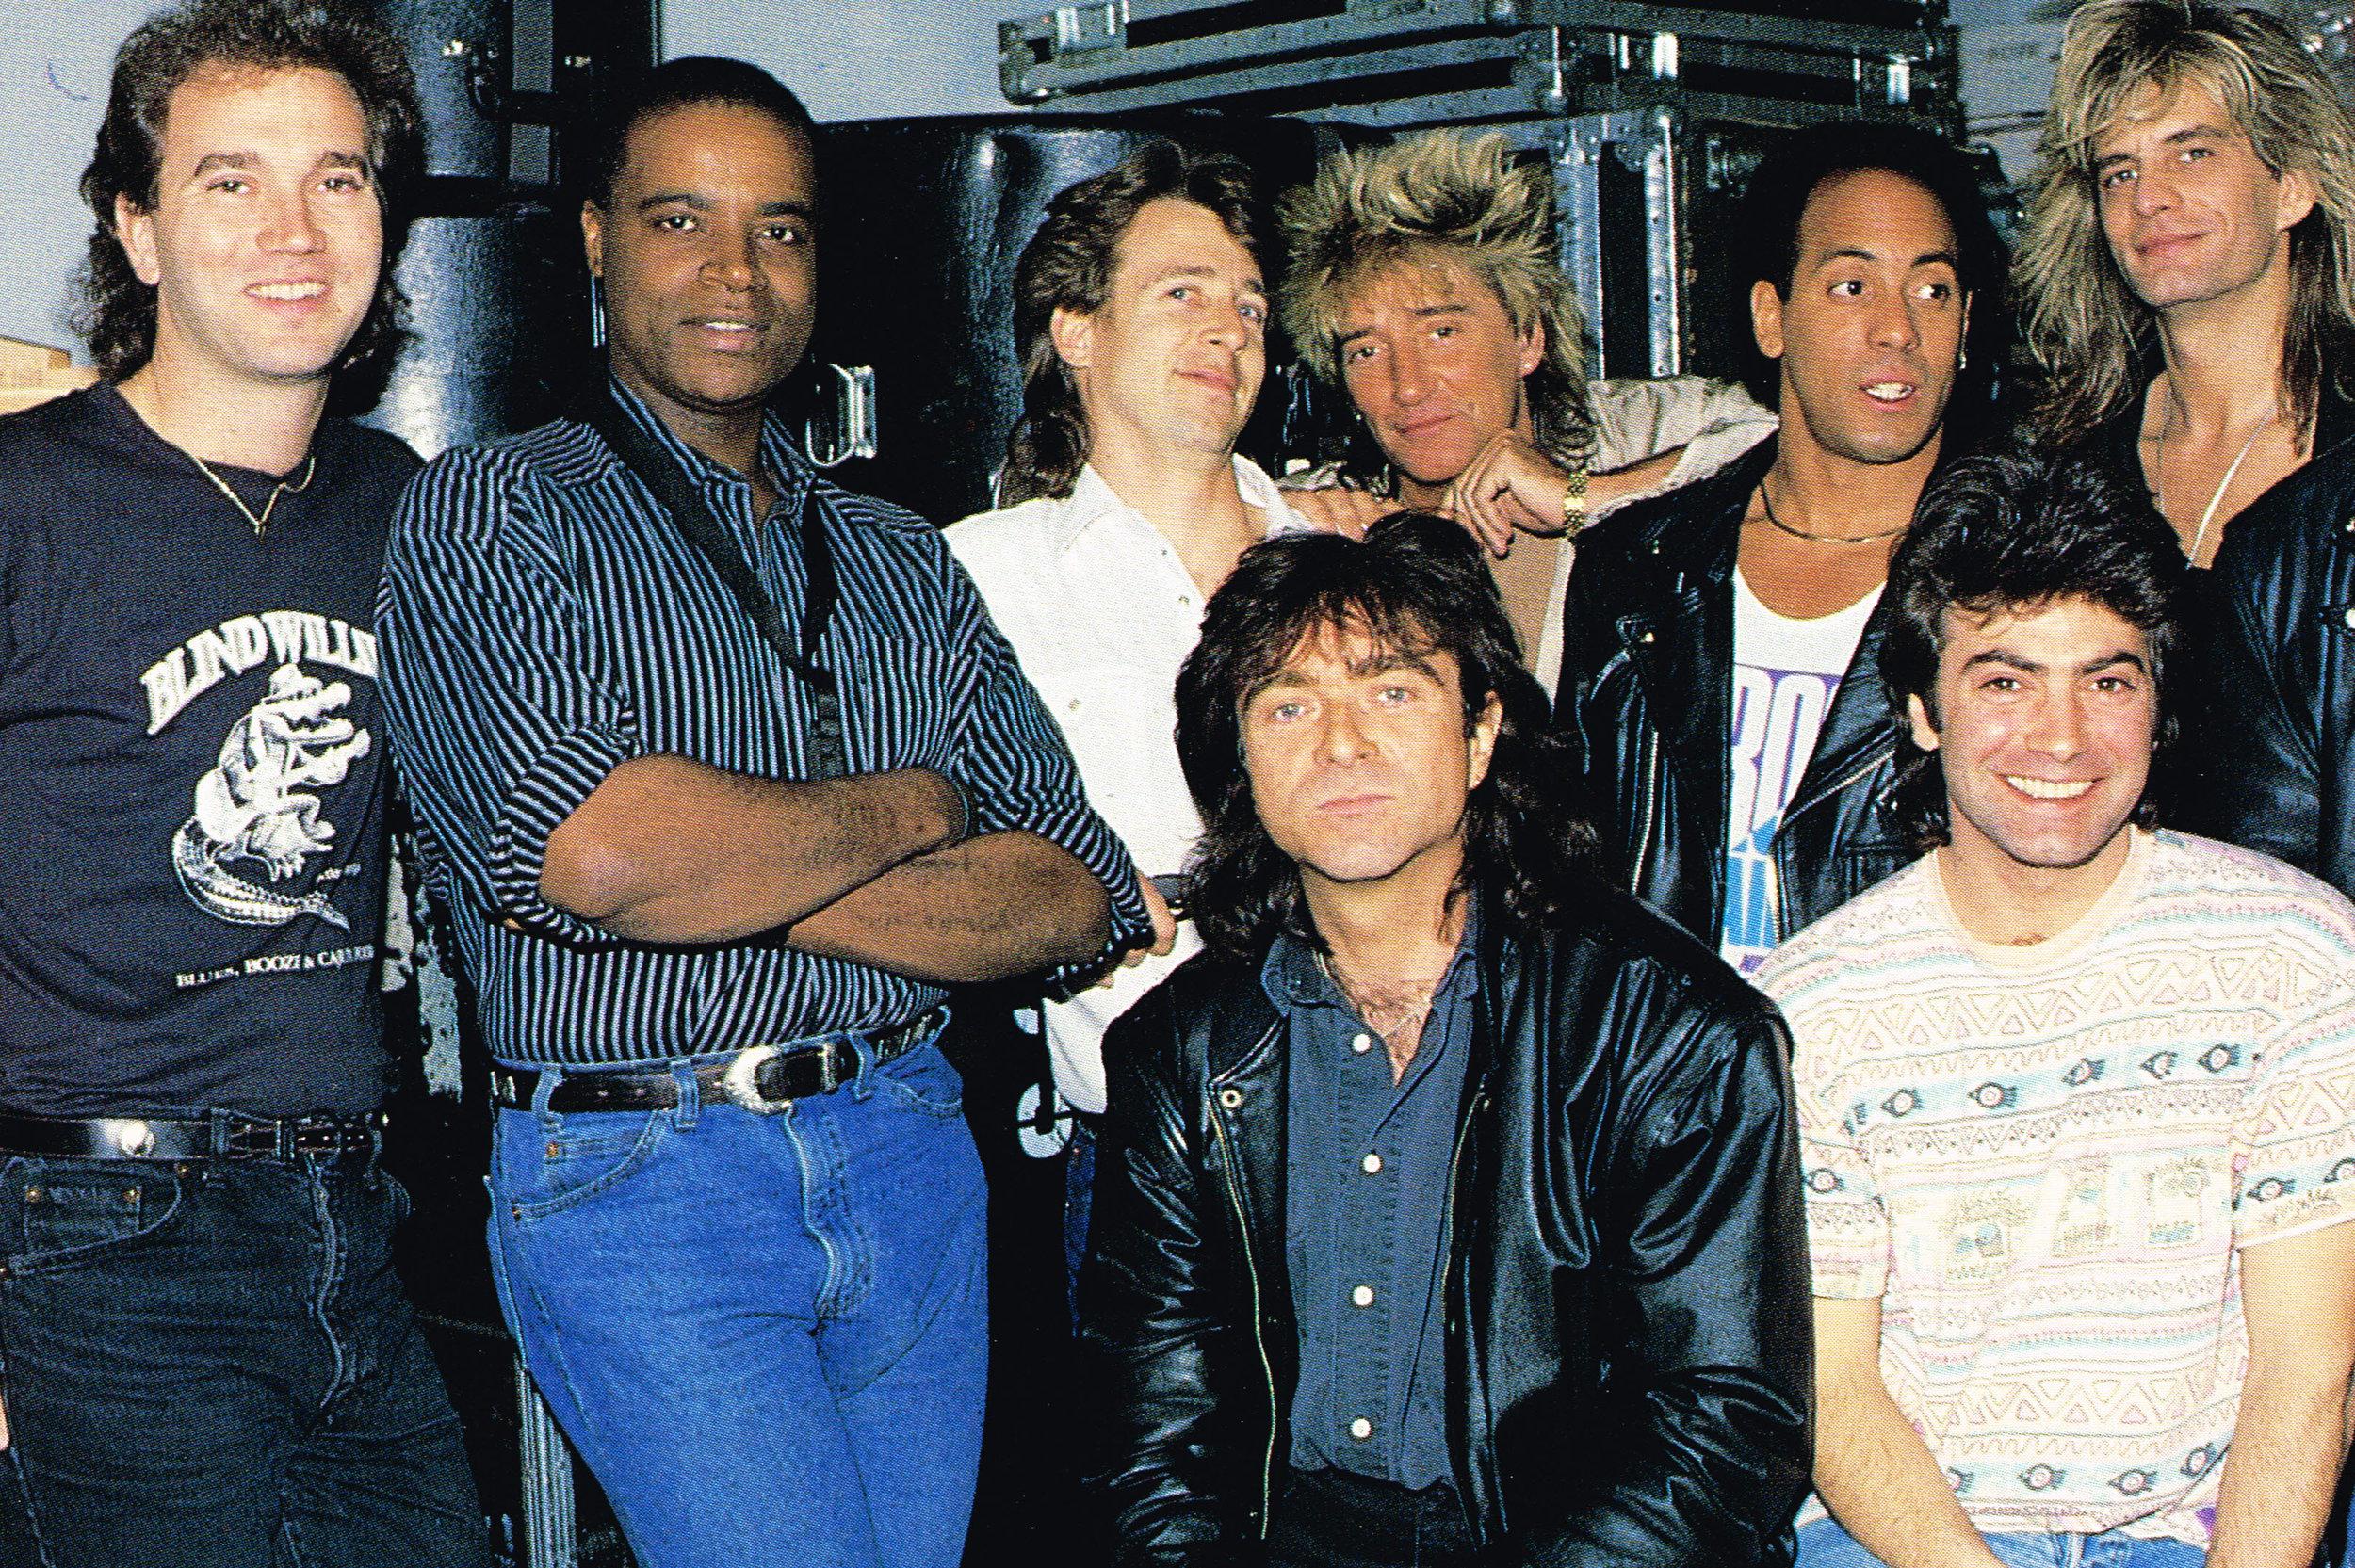 Rod Stewart Band, 1989